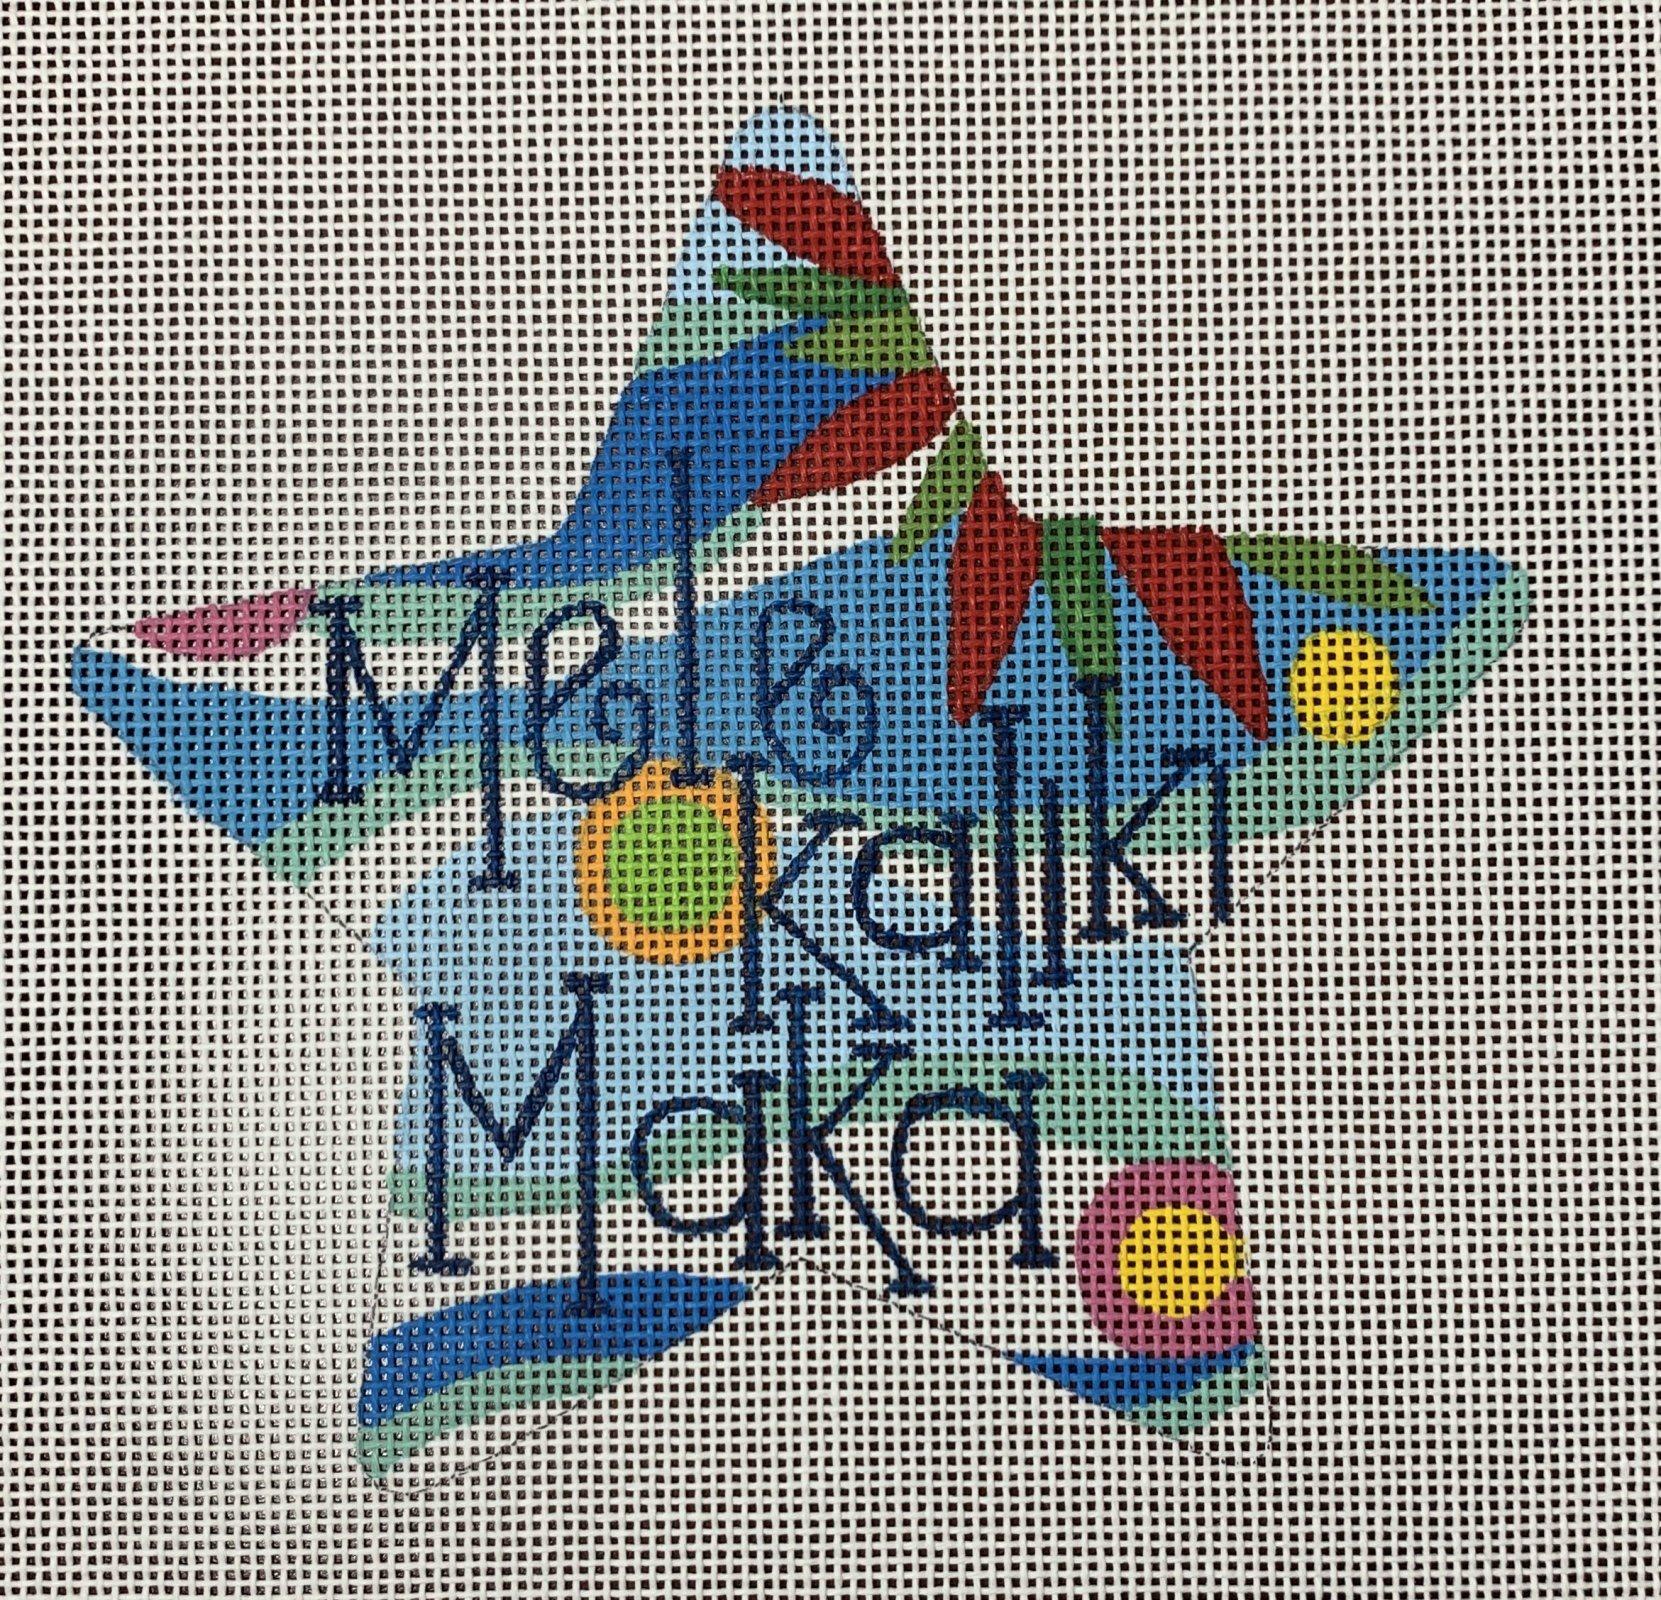 Mele Kalikimaka Star